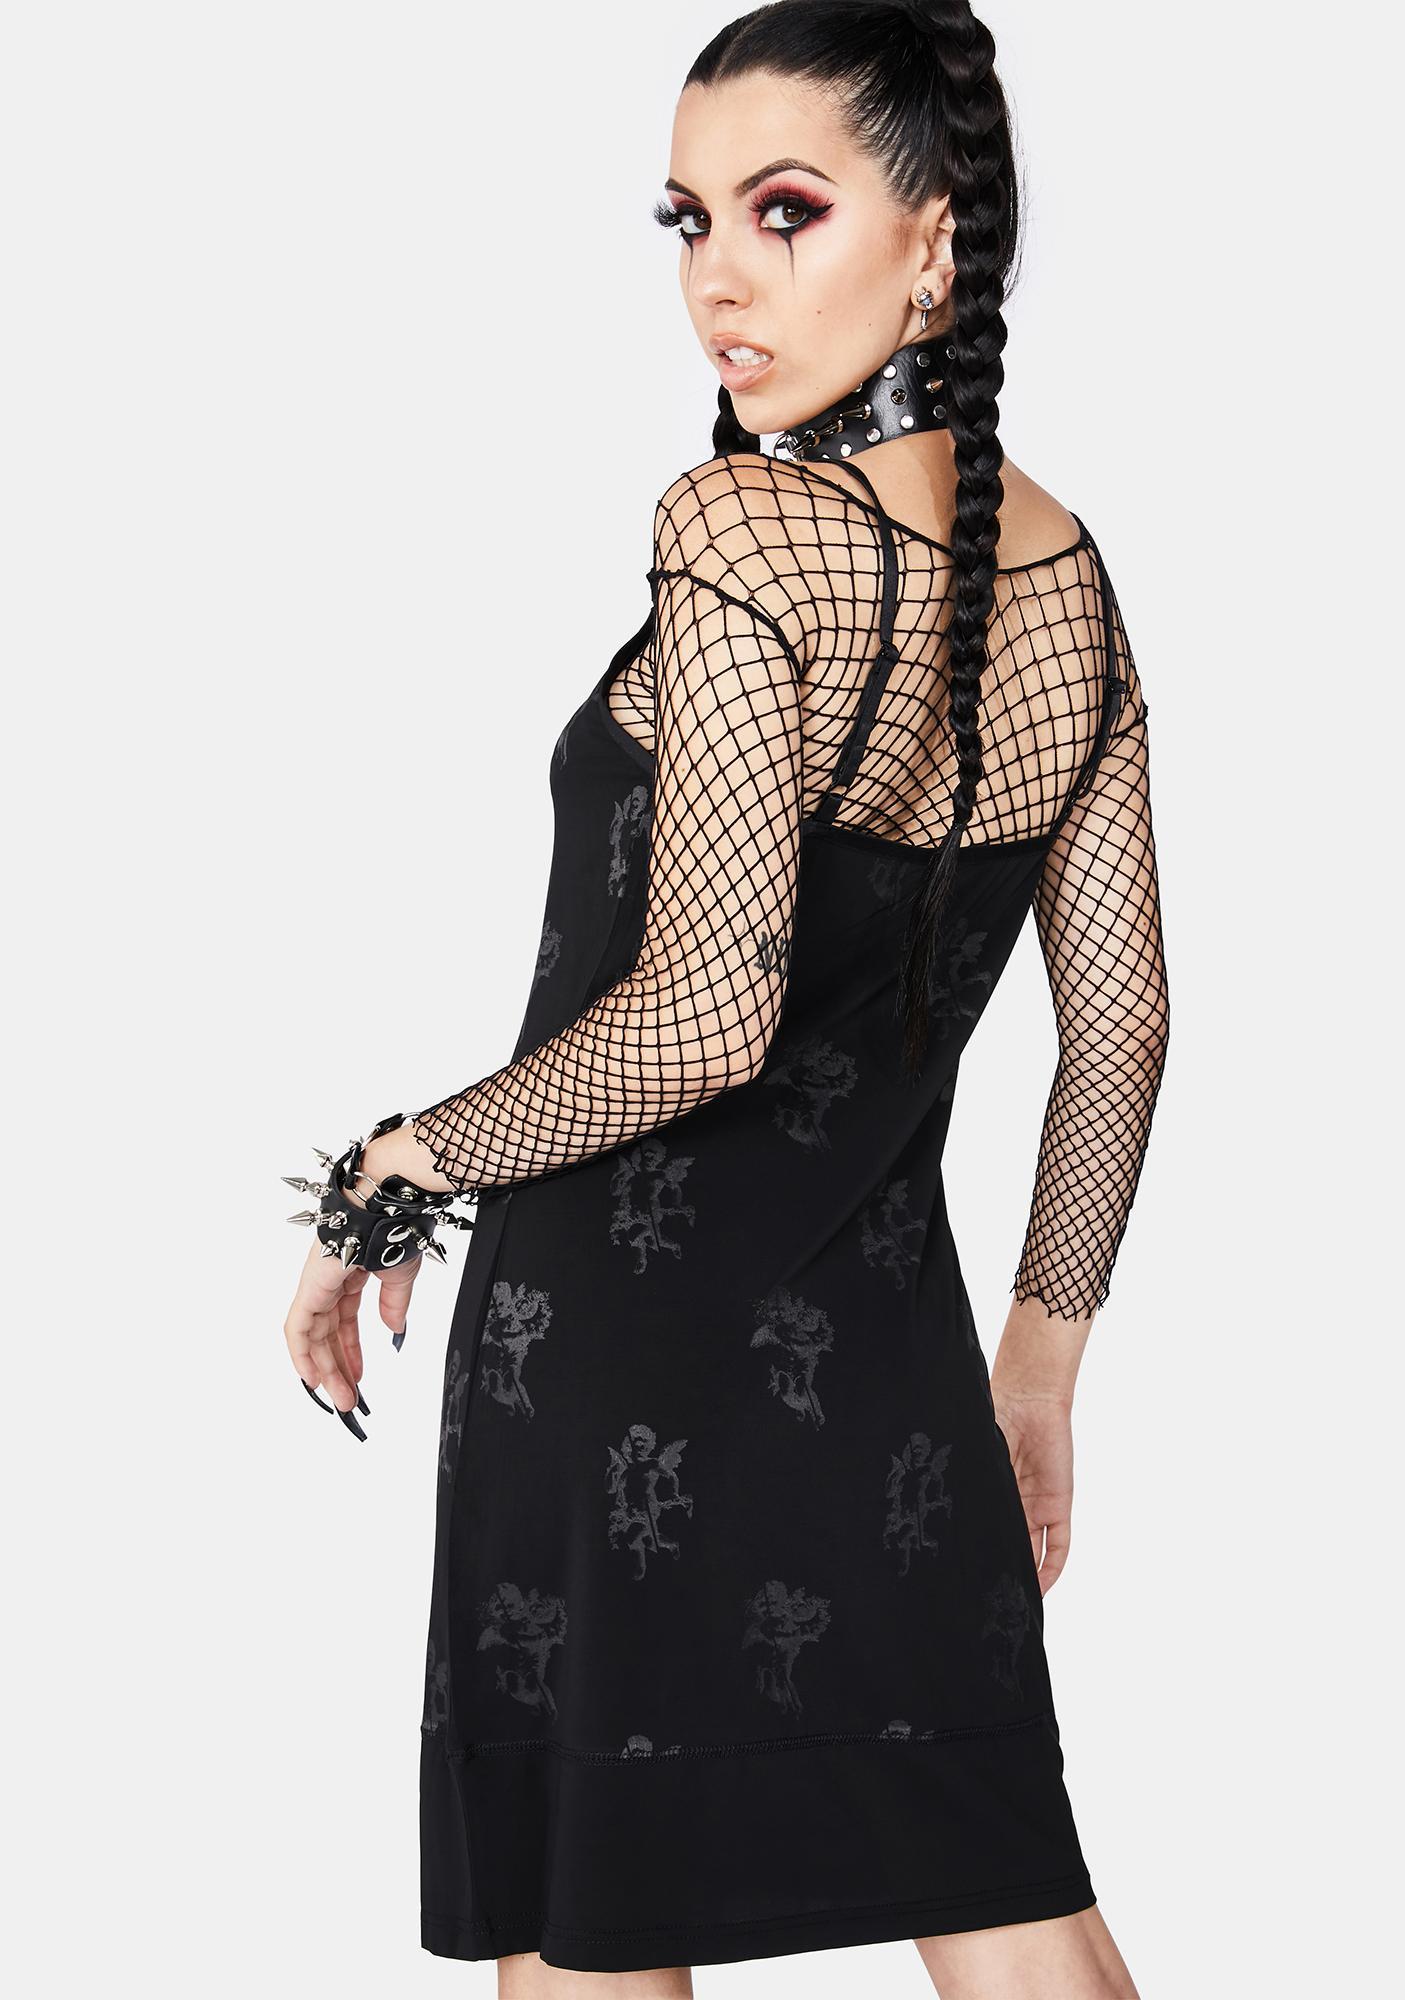 Black Friday Shadow Slip Dress